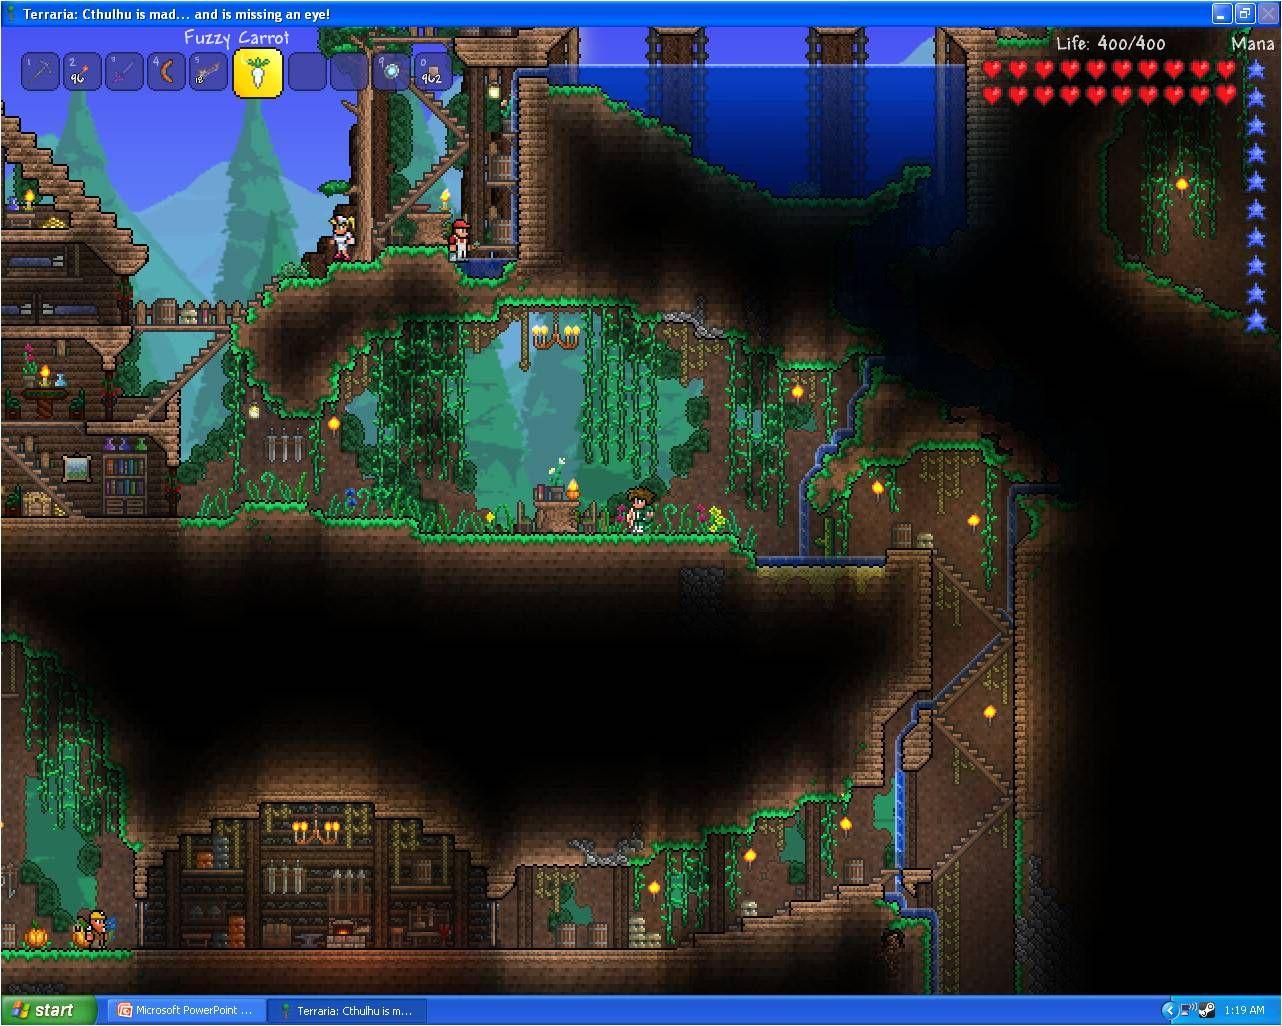 Terraria World Videojuegos Terrarios Y Despacito